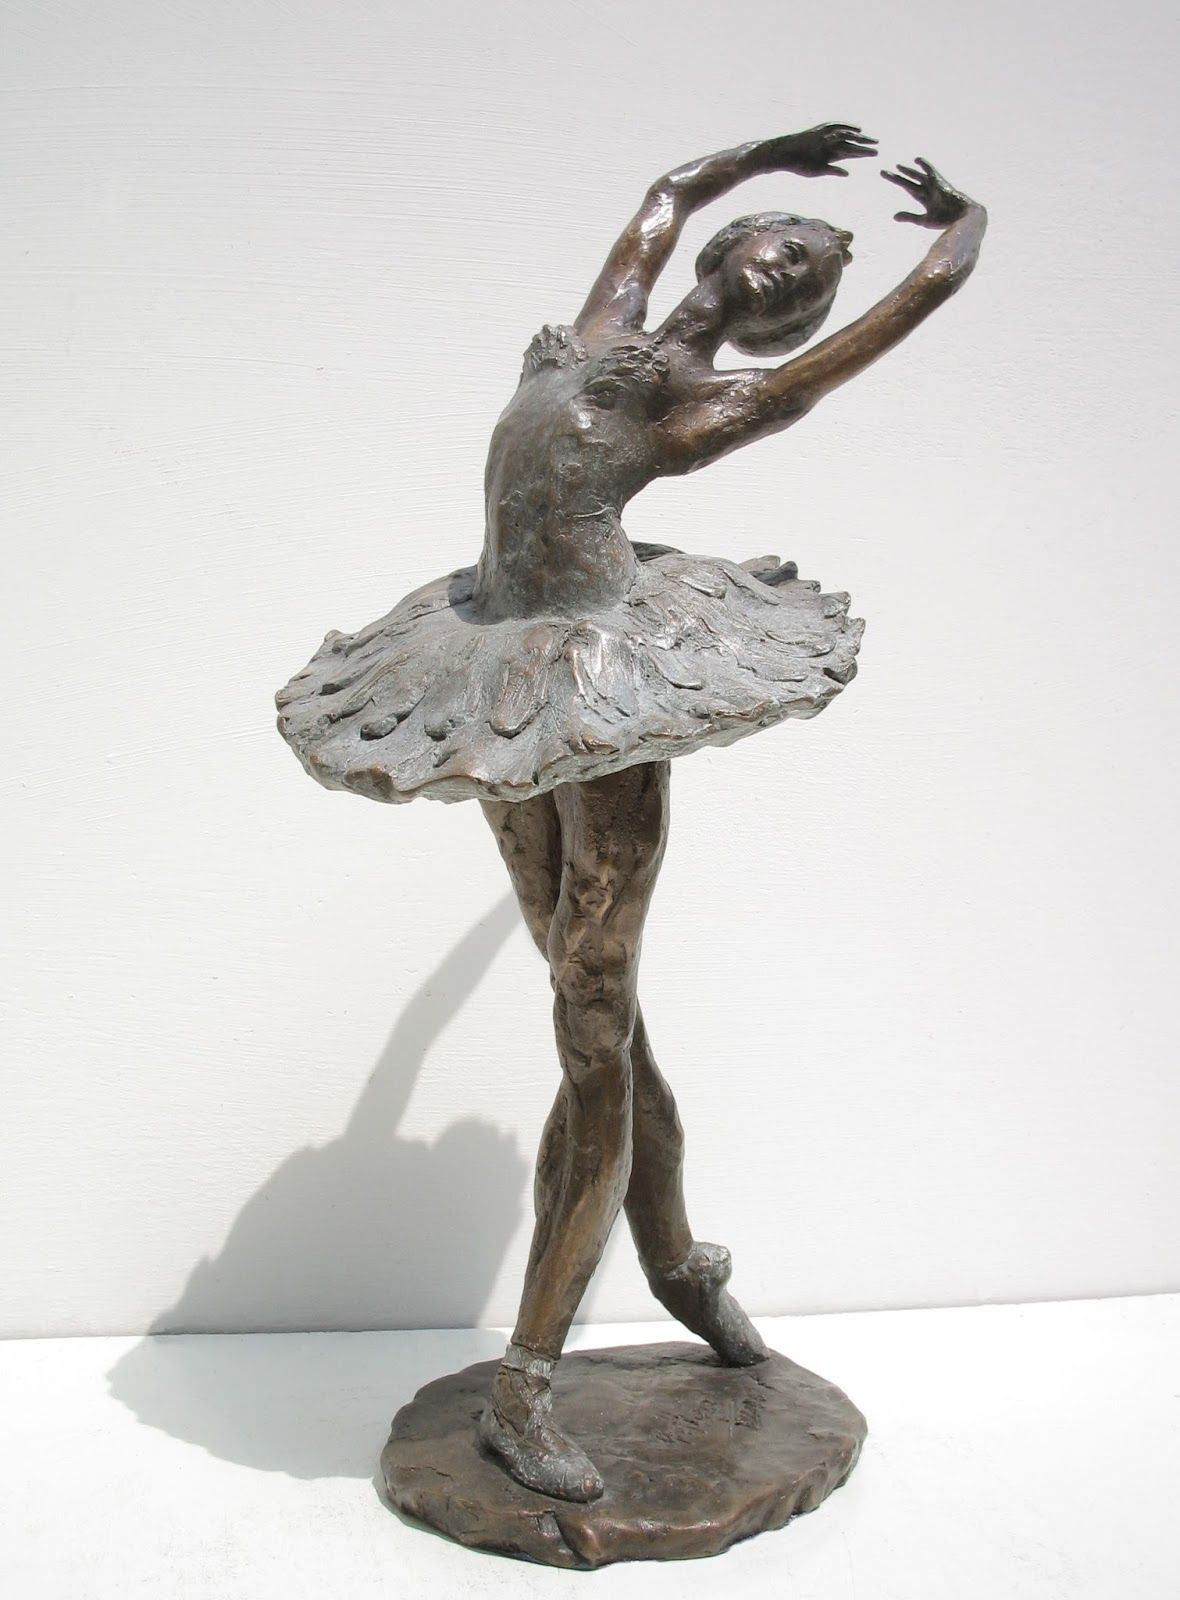 miljö Medicin Port  Vittorio Tessaro, 1958 | Figurative sculptor | Sculpture, Bronze sculpture,  Sculpture art